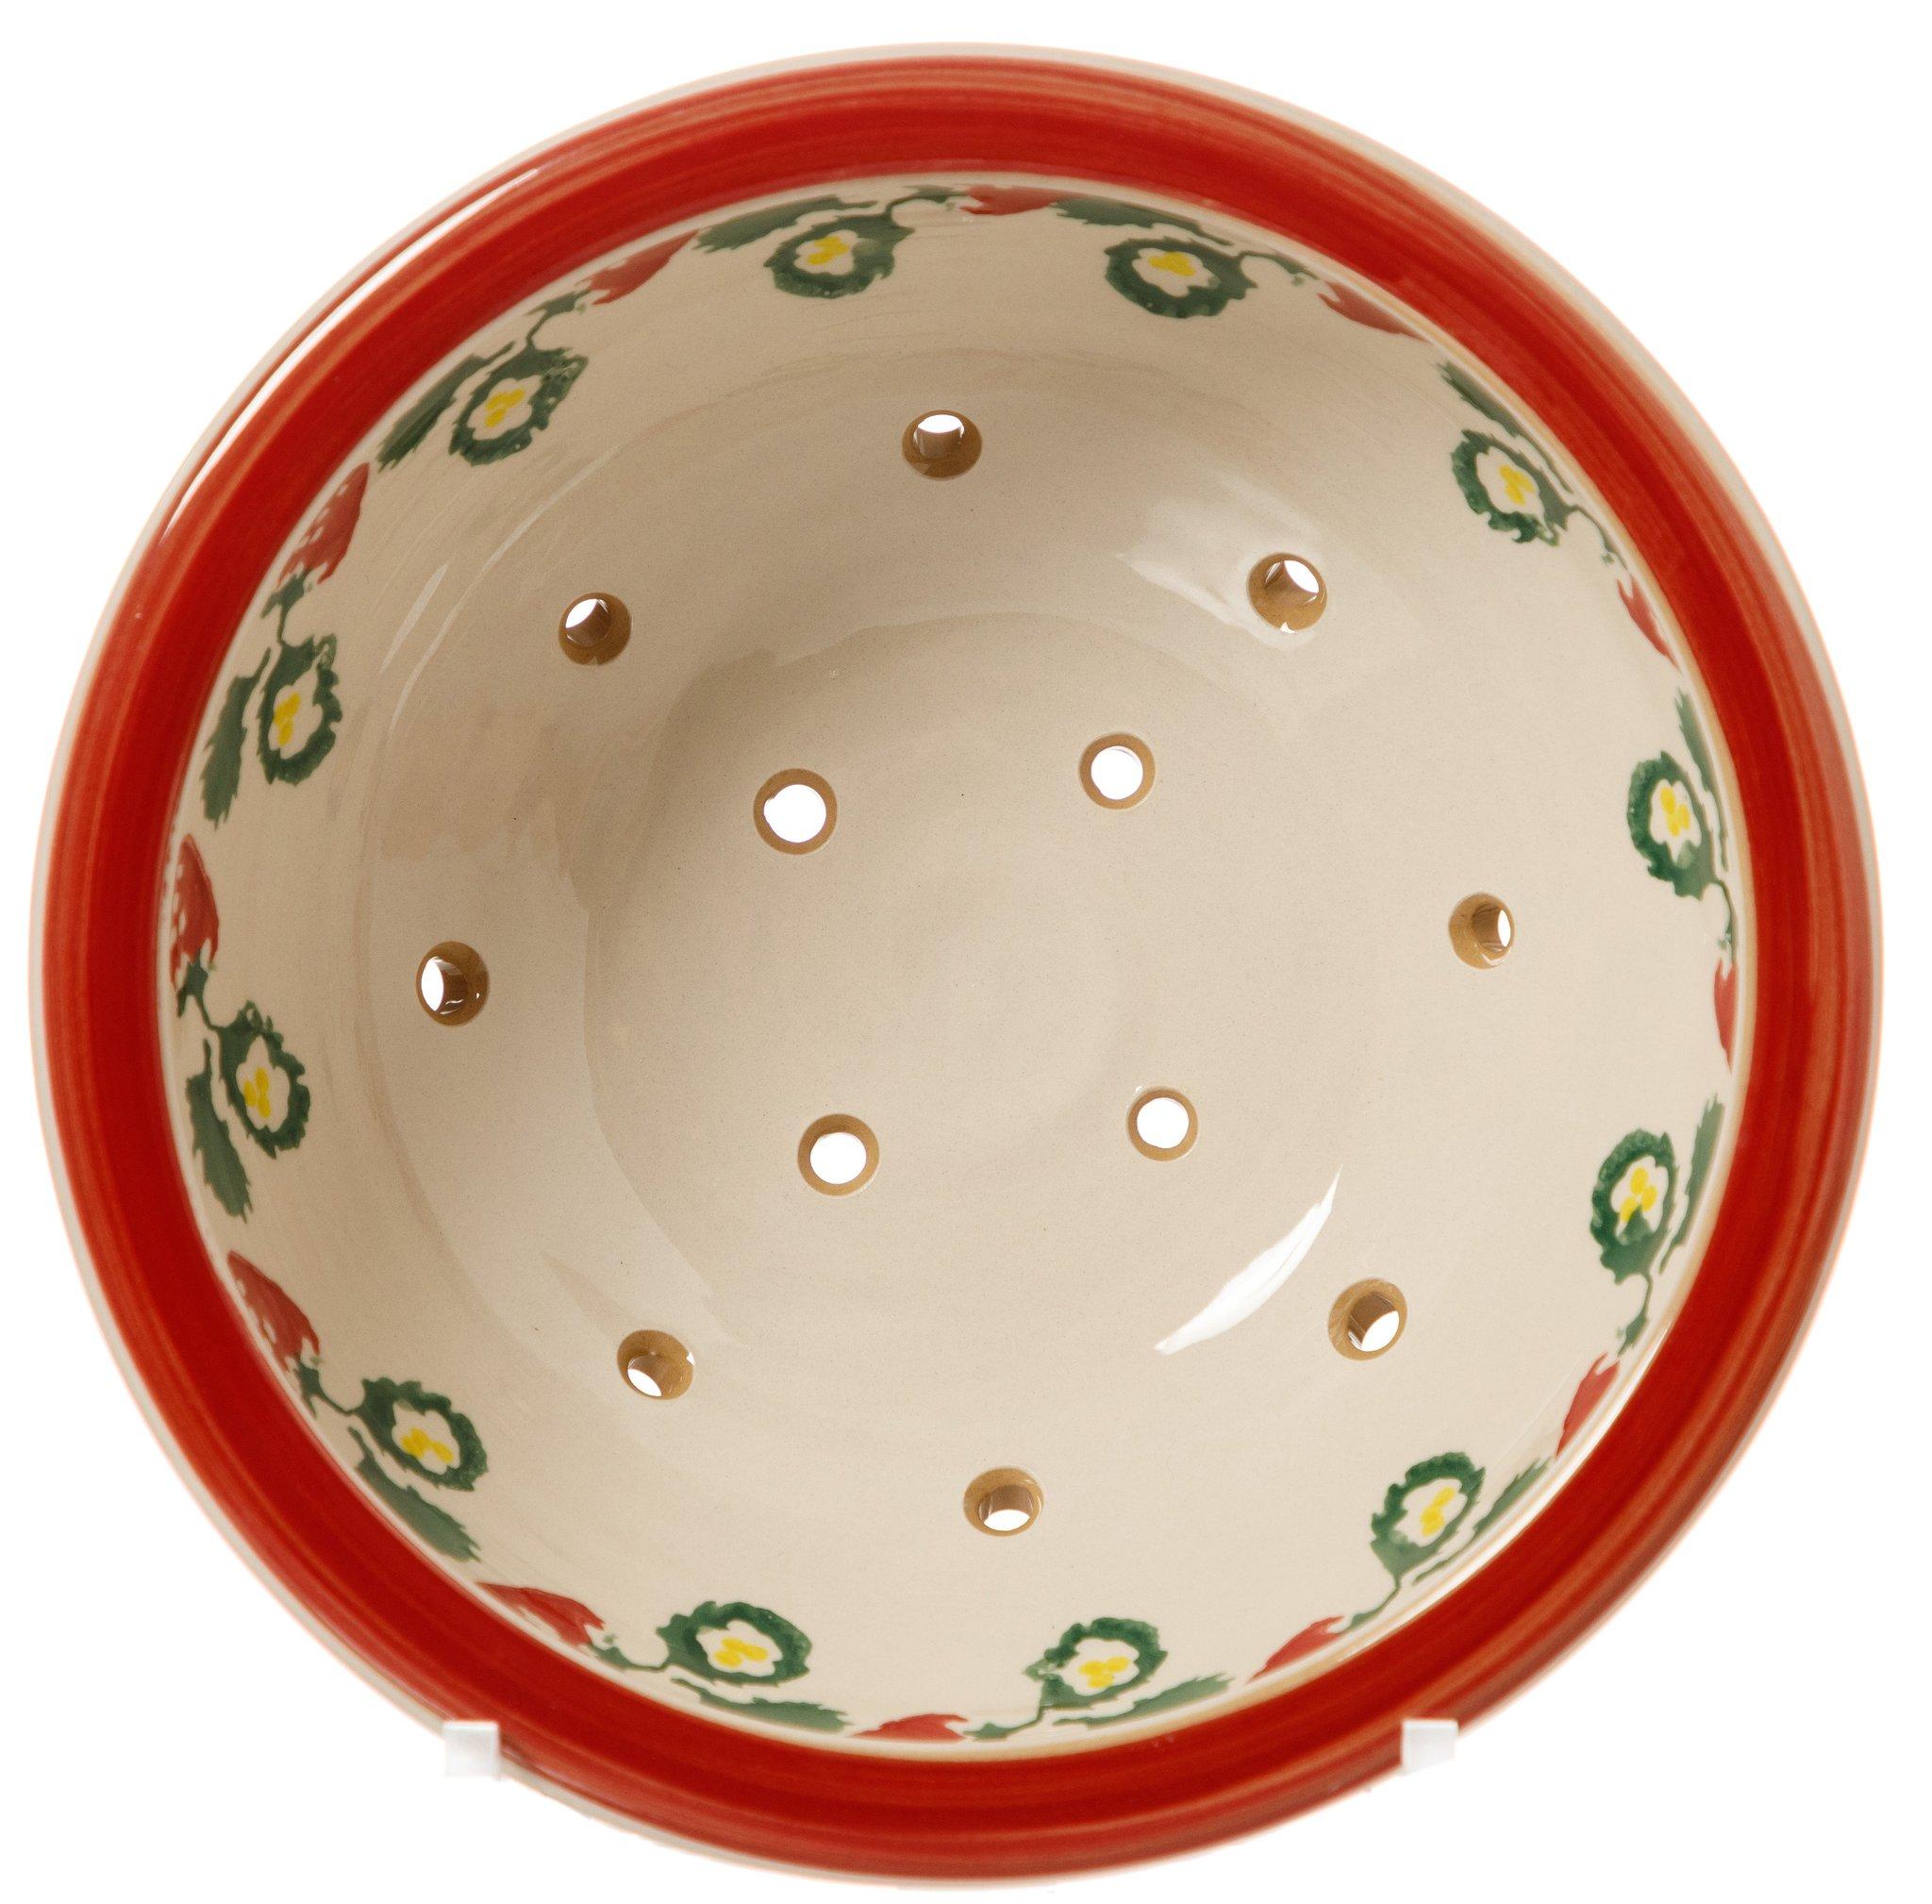 strawberry-bowl-1